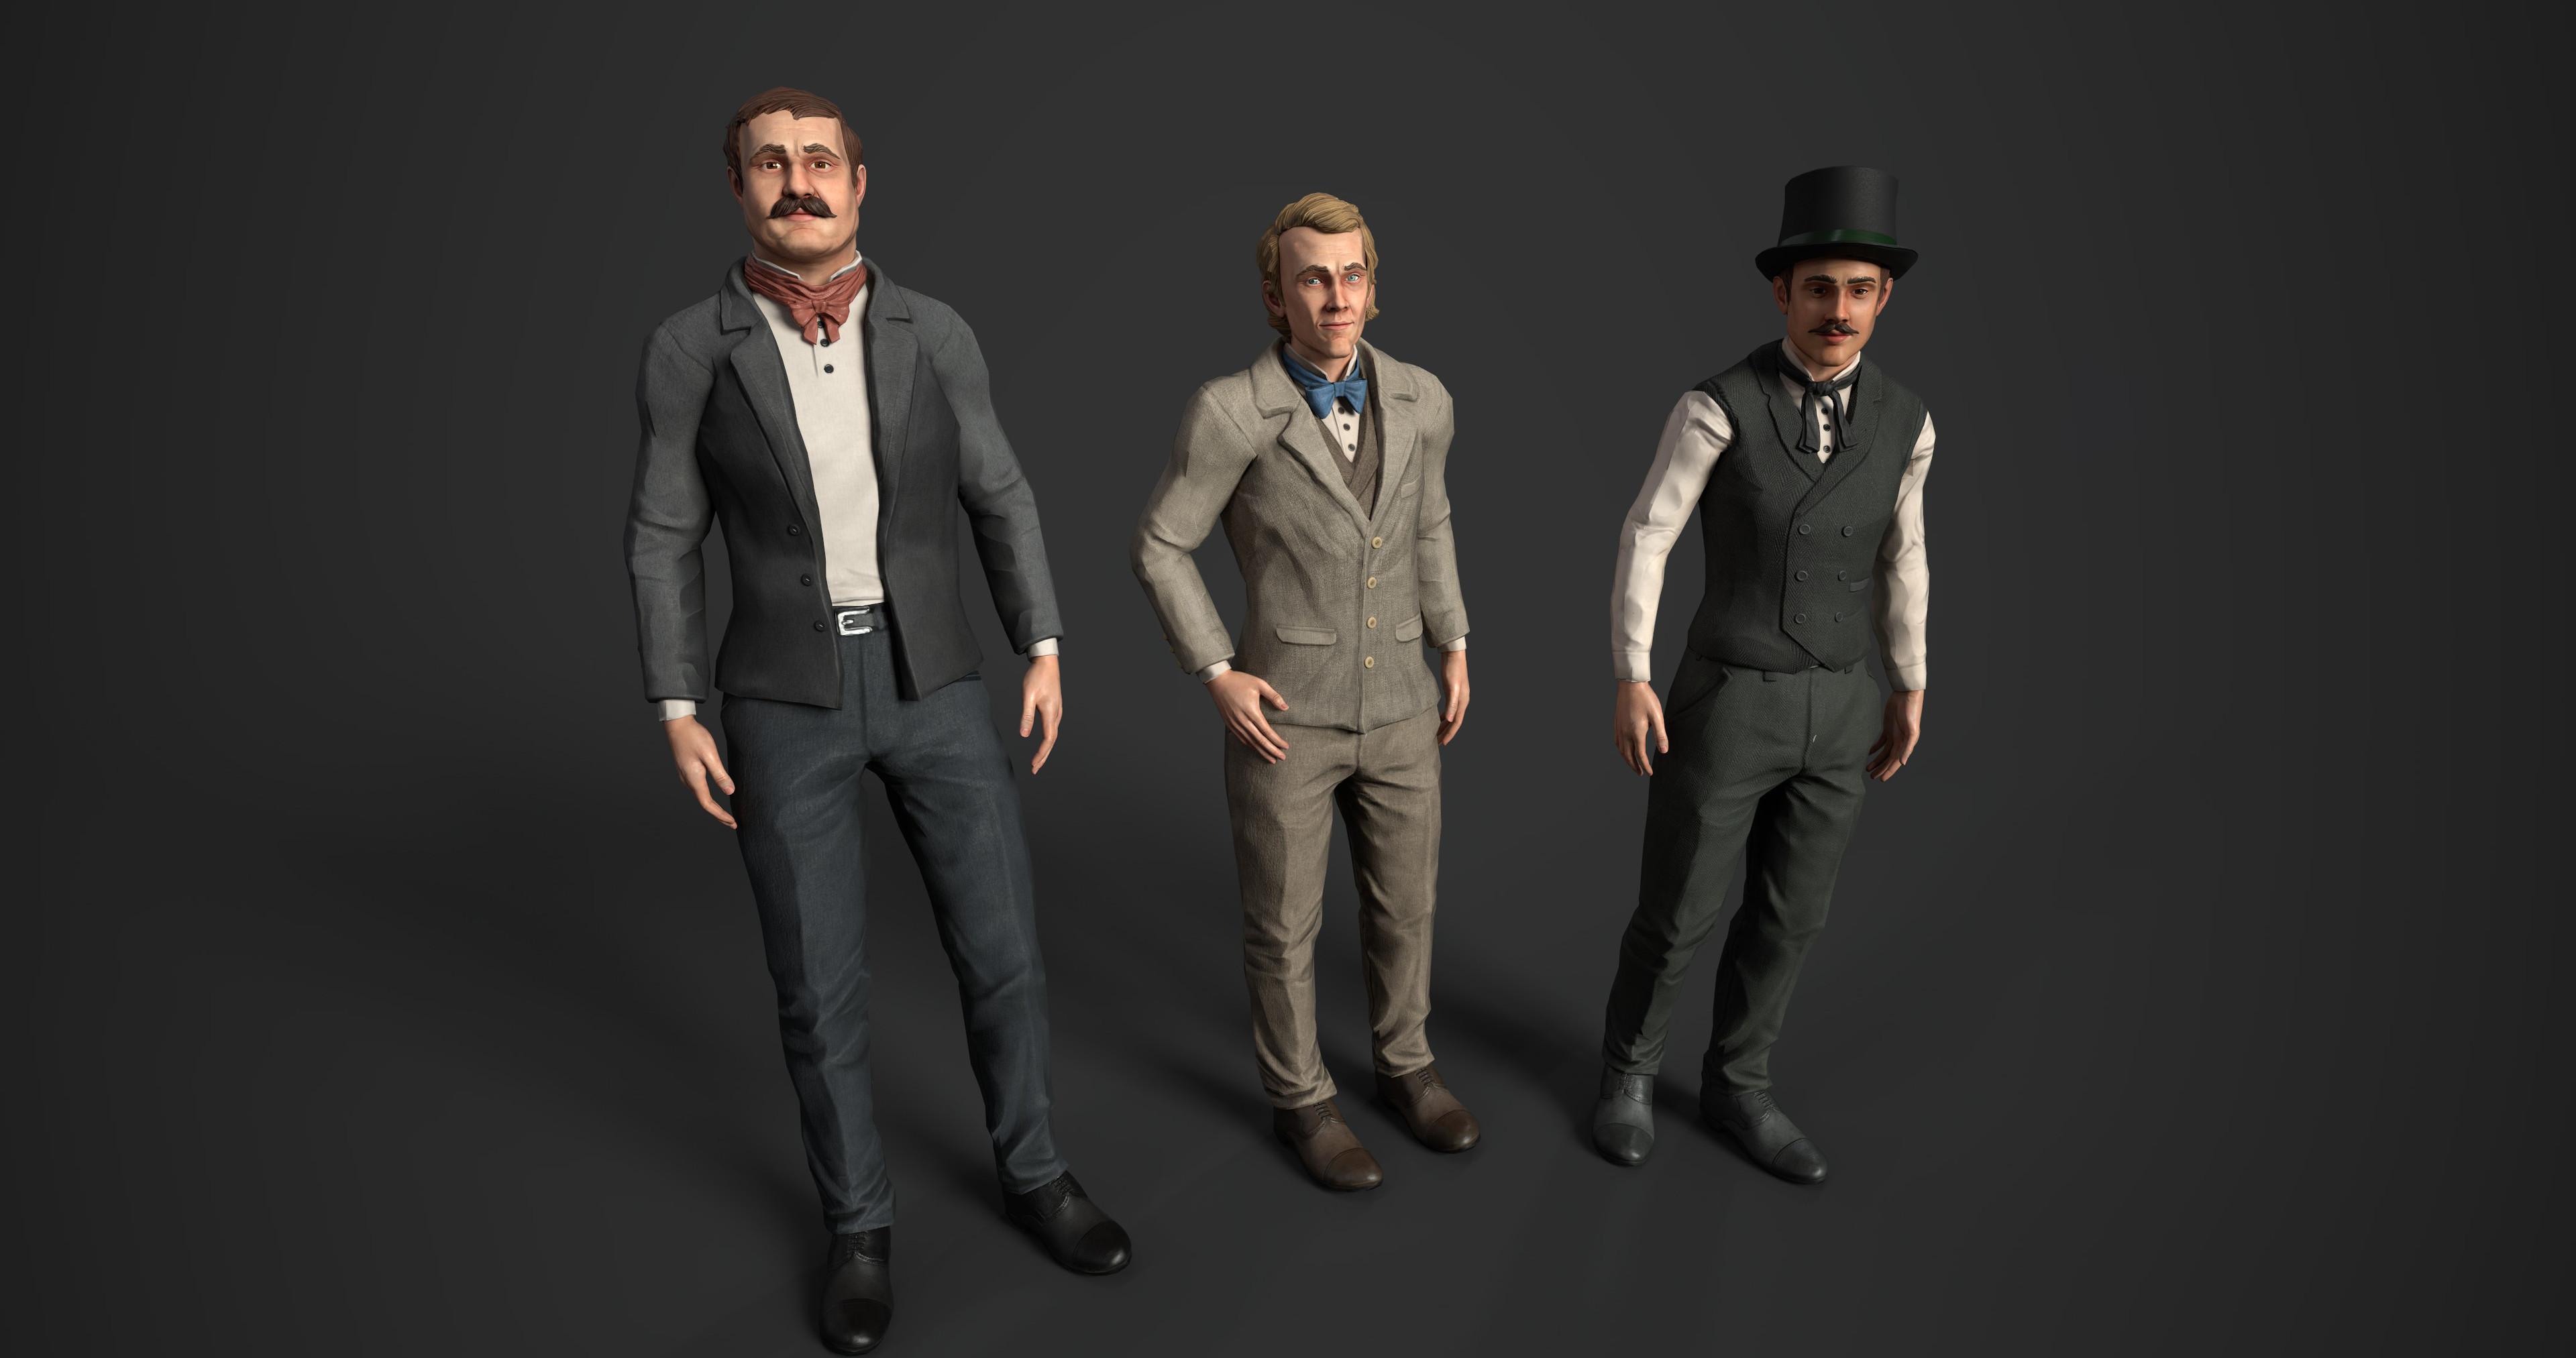 High society characters